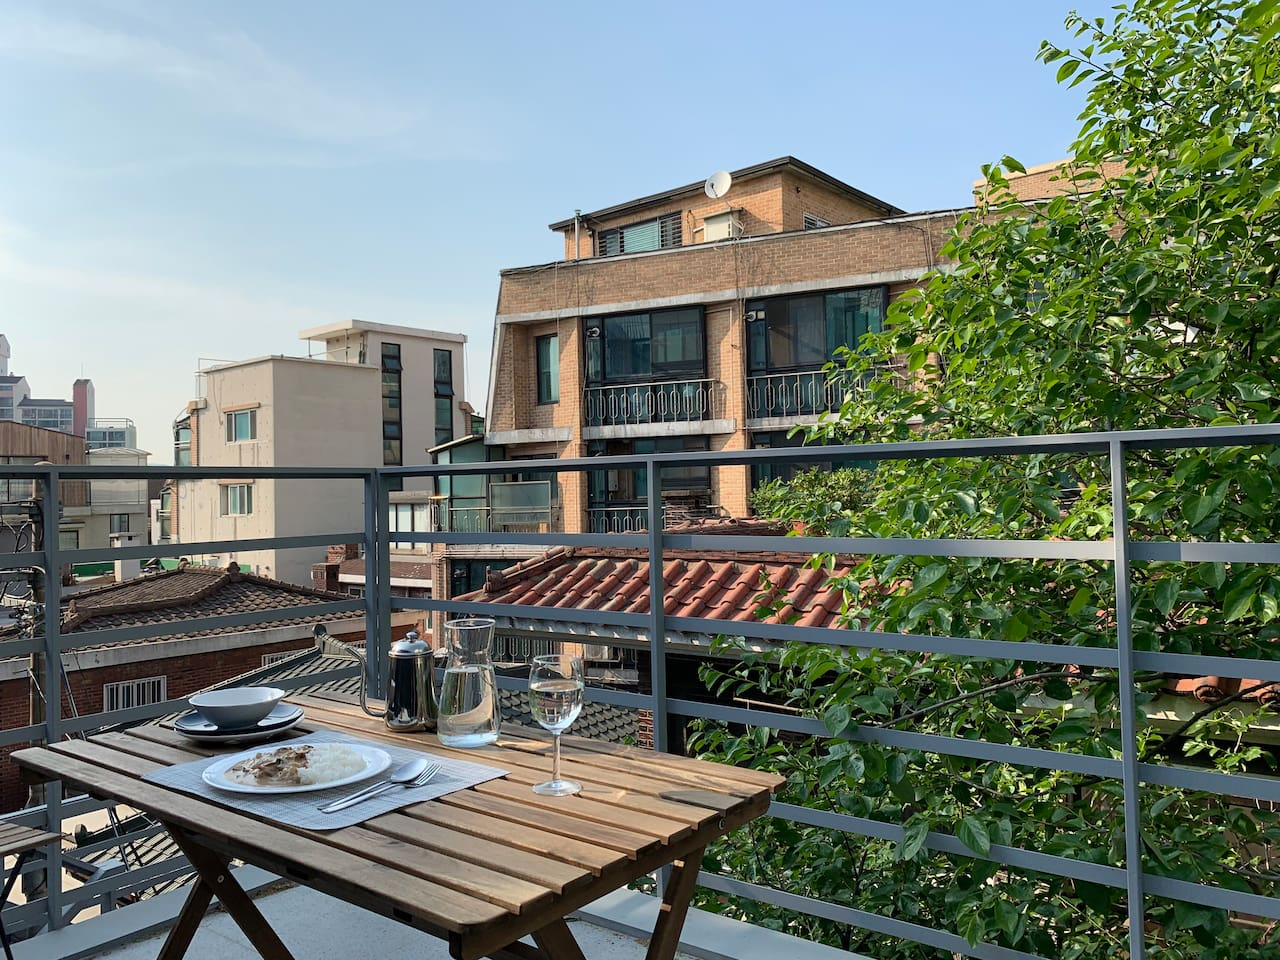 Bingo hostel Private rooftop